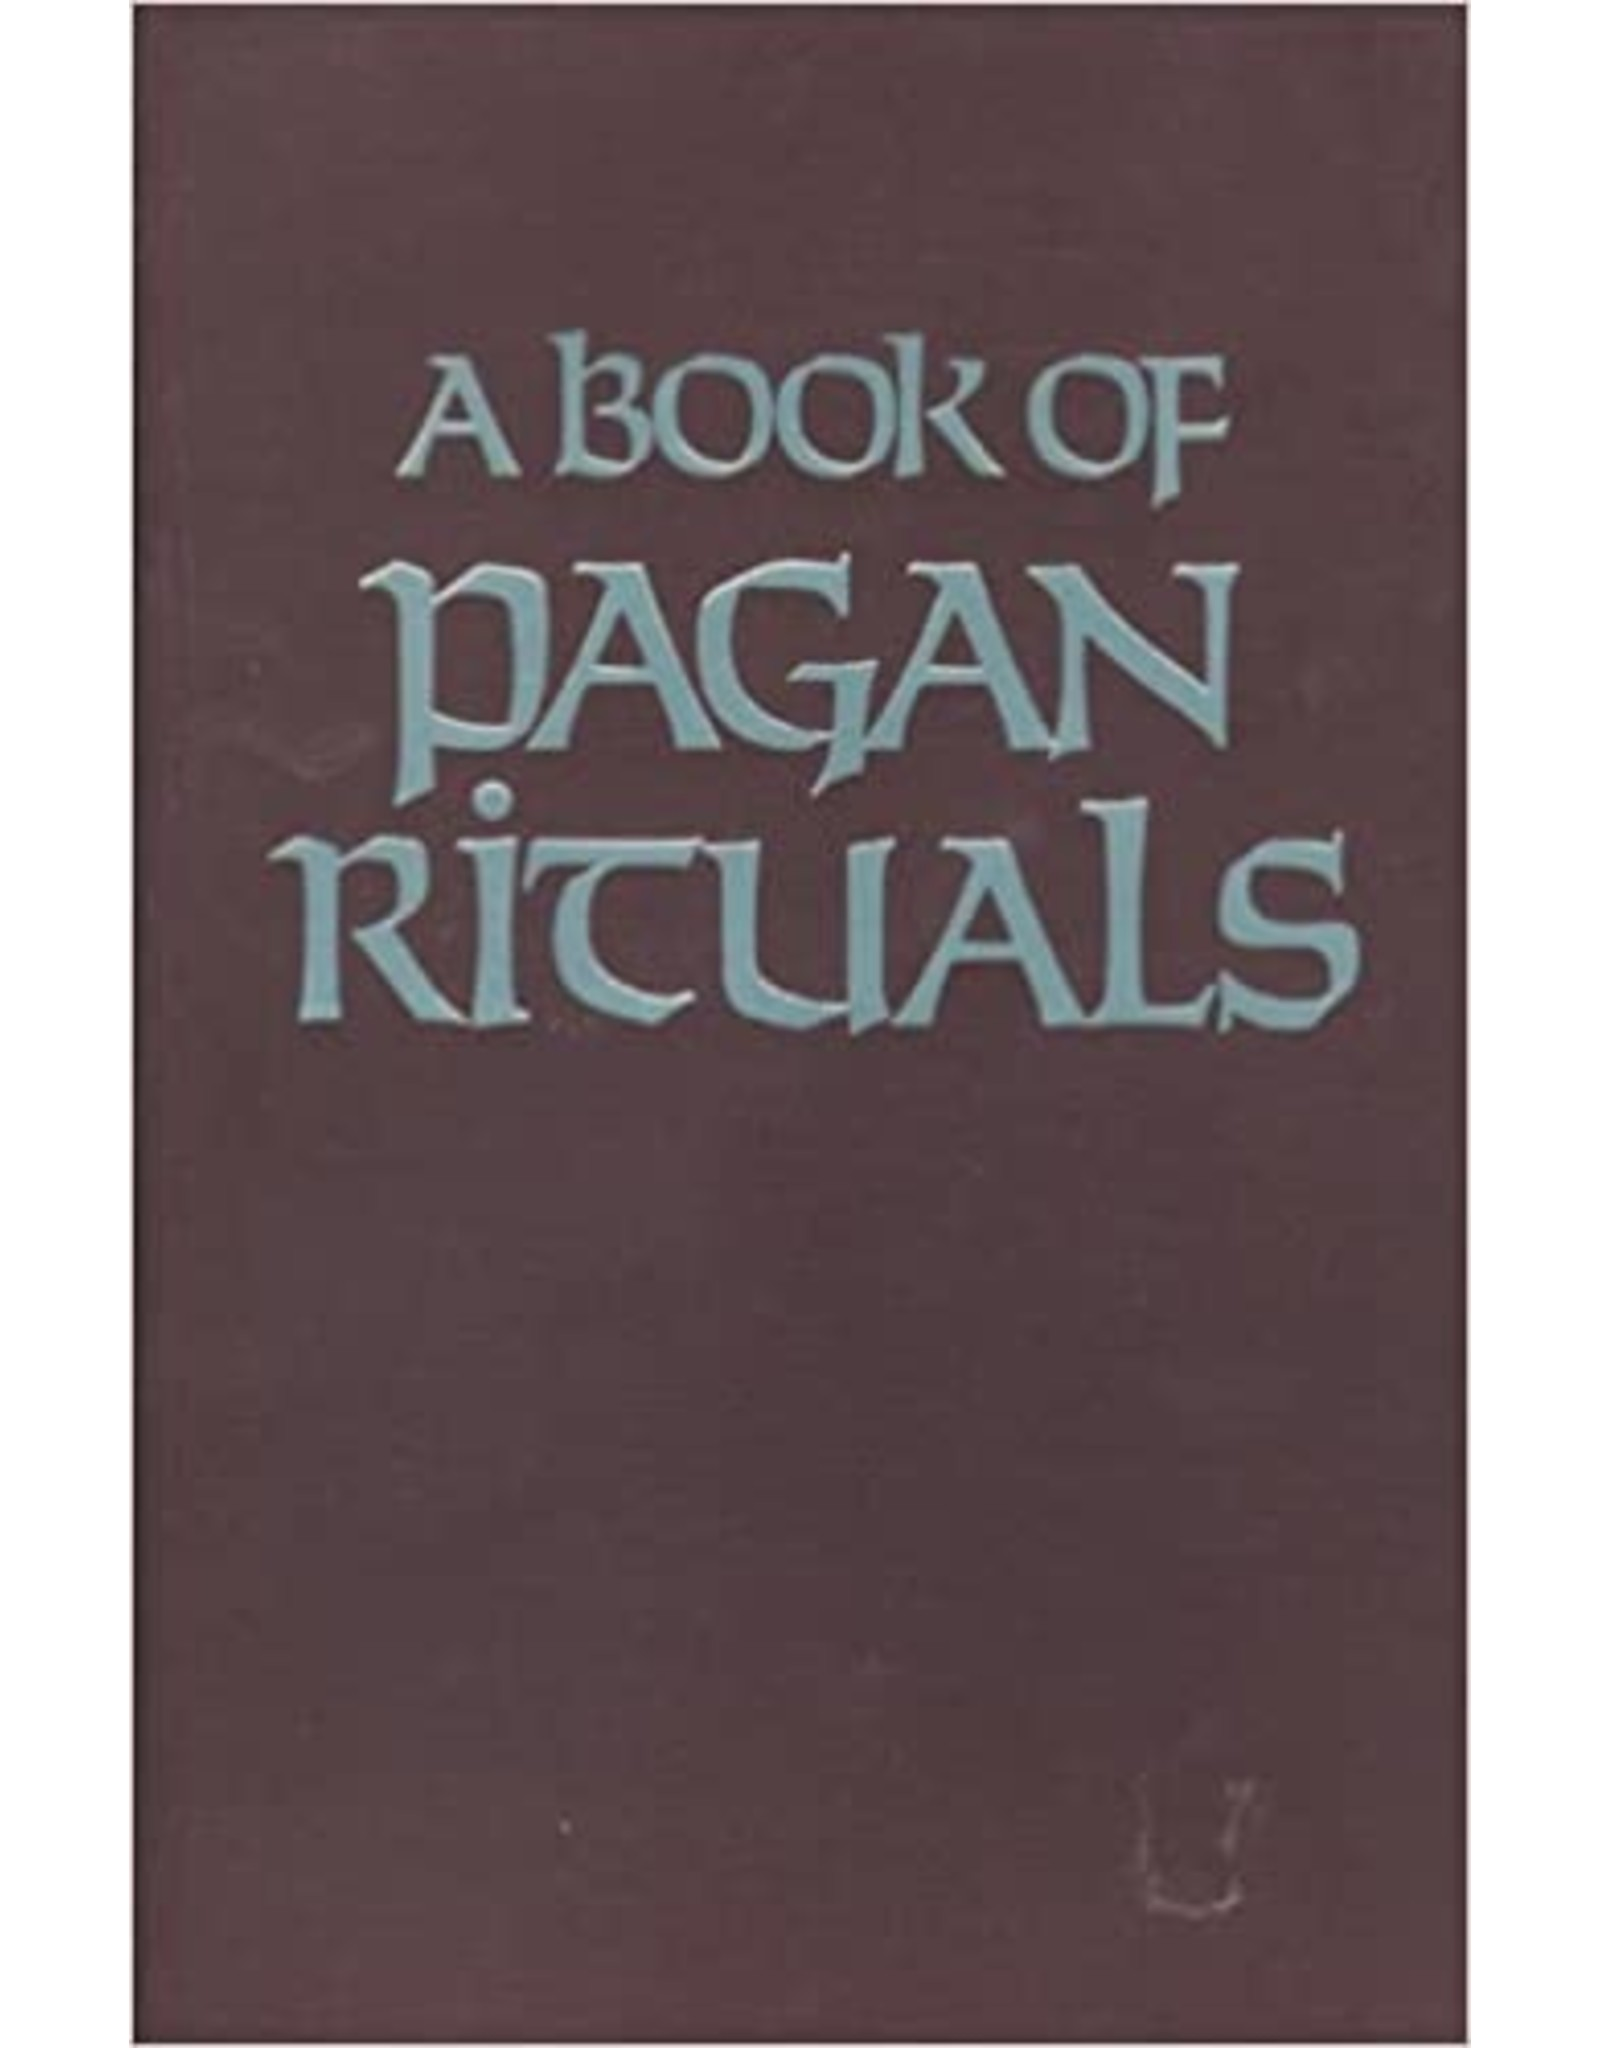 A Book of Pagan Ritual